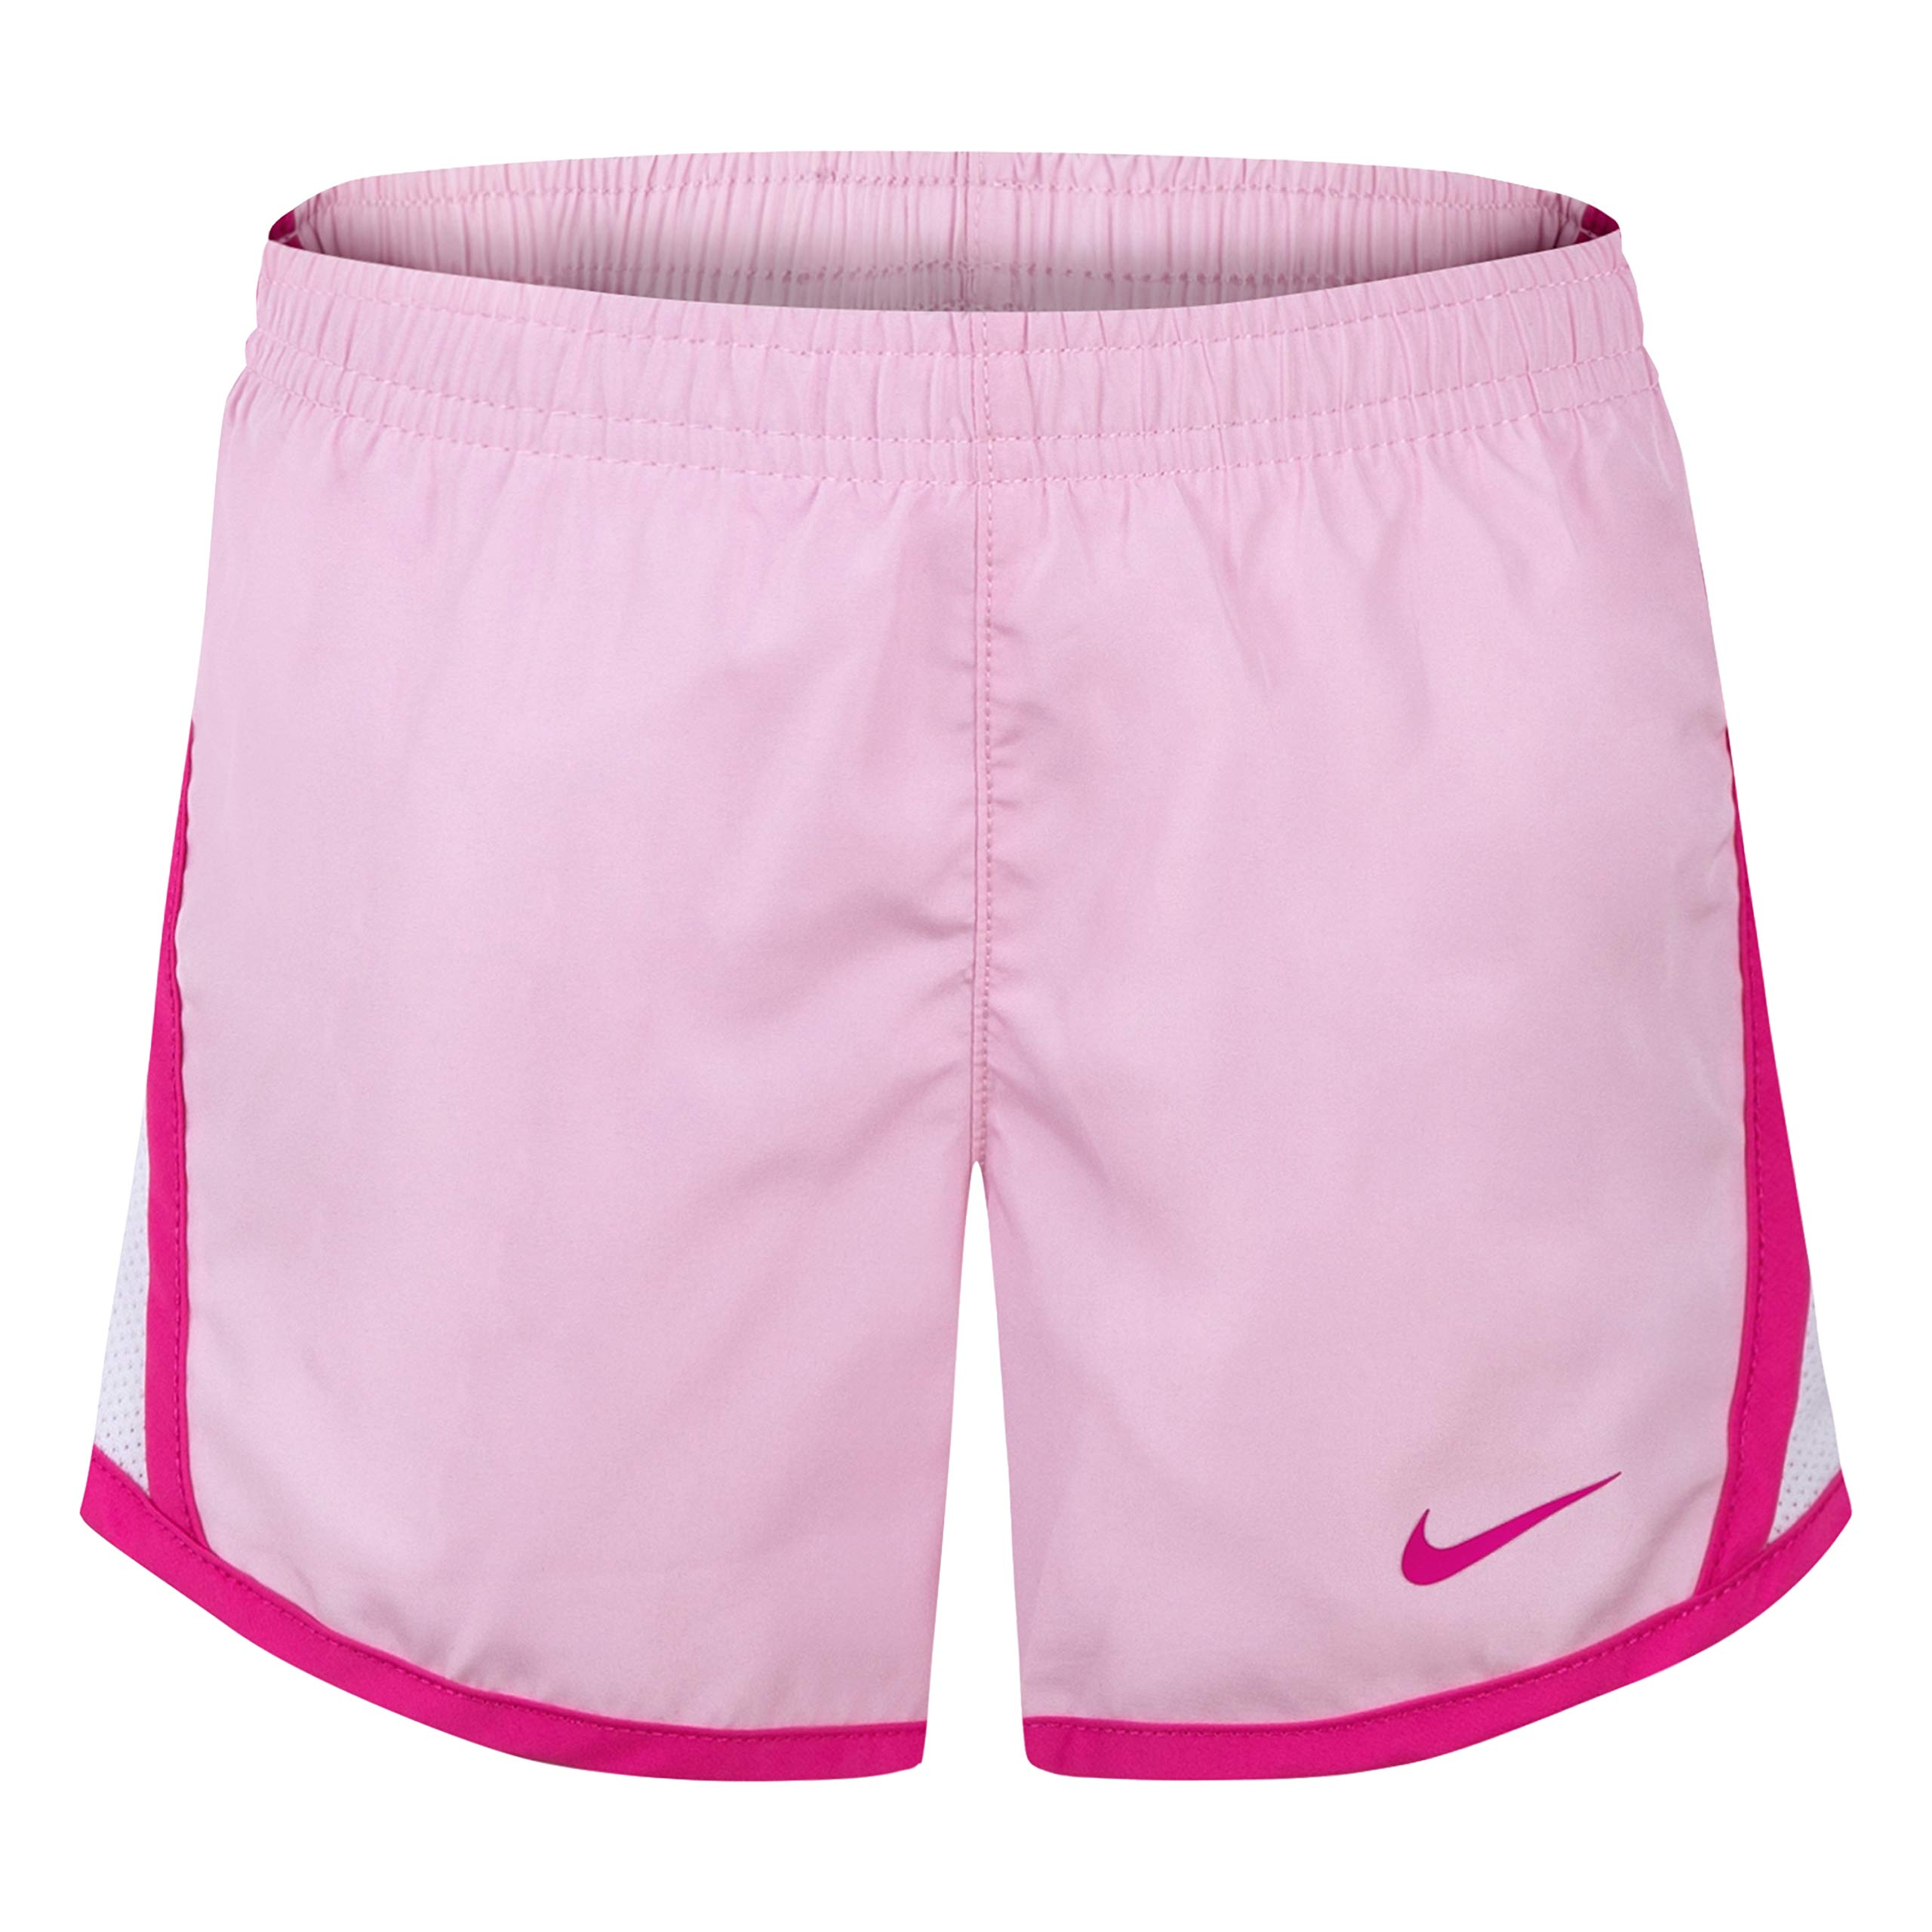 NIKE Children's Apparel Girls' Little Dri-FIT Tempo Shorts, Pink Foam, 6X by NIKE Children's Apparel